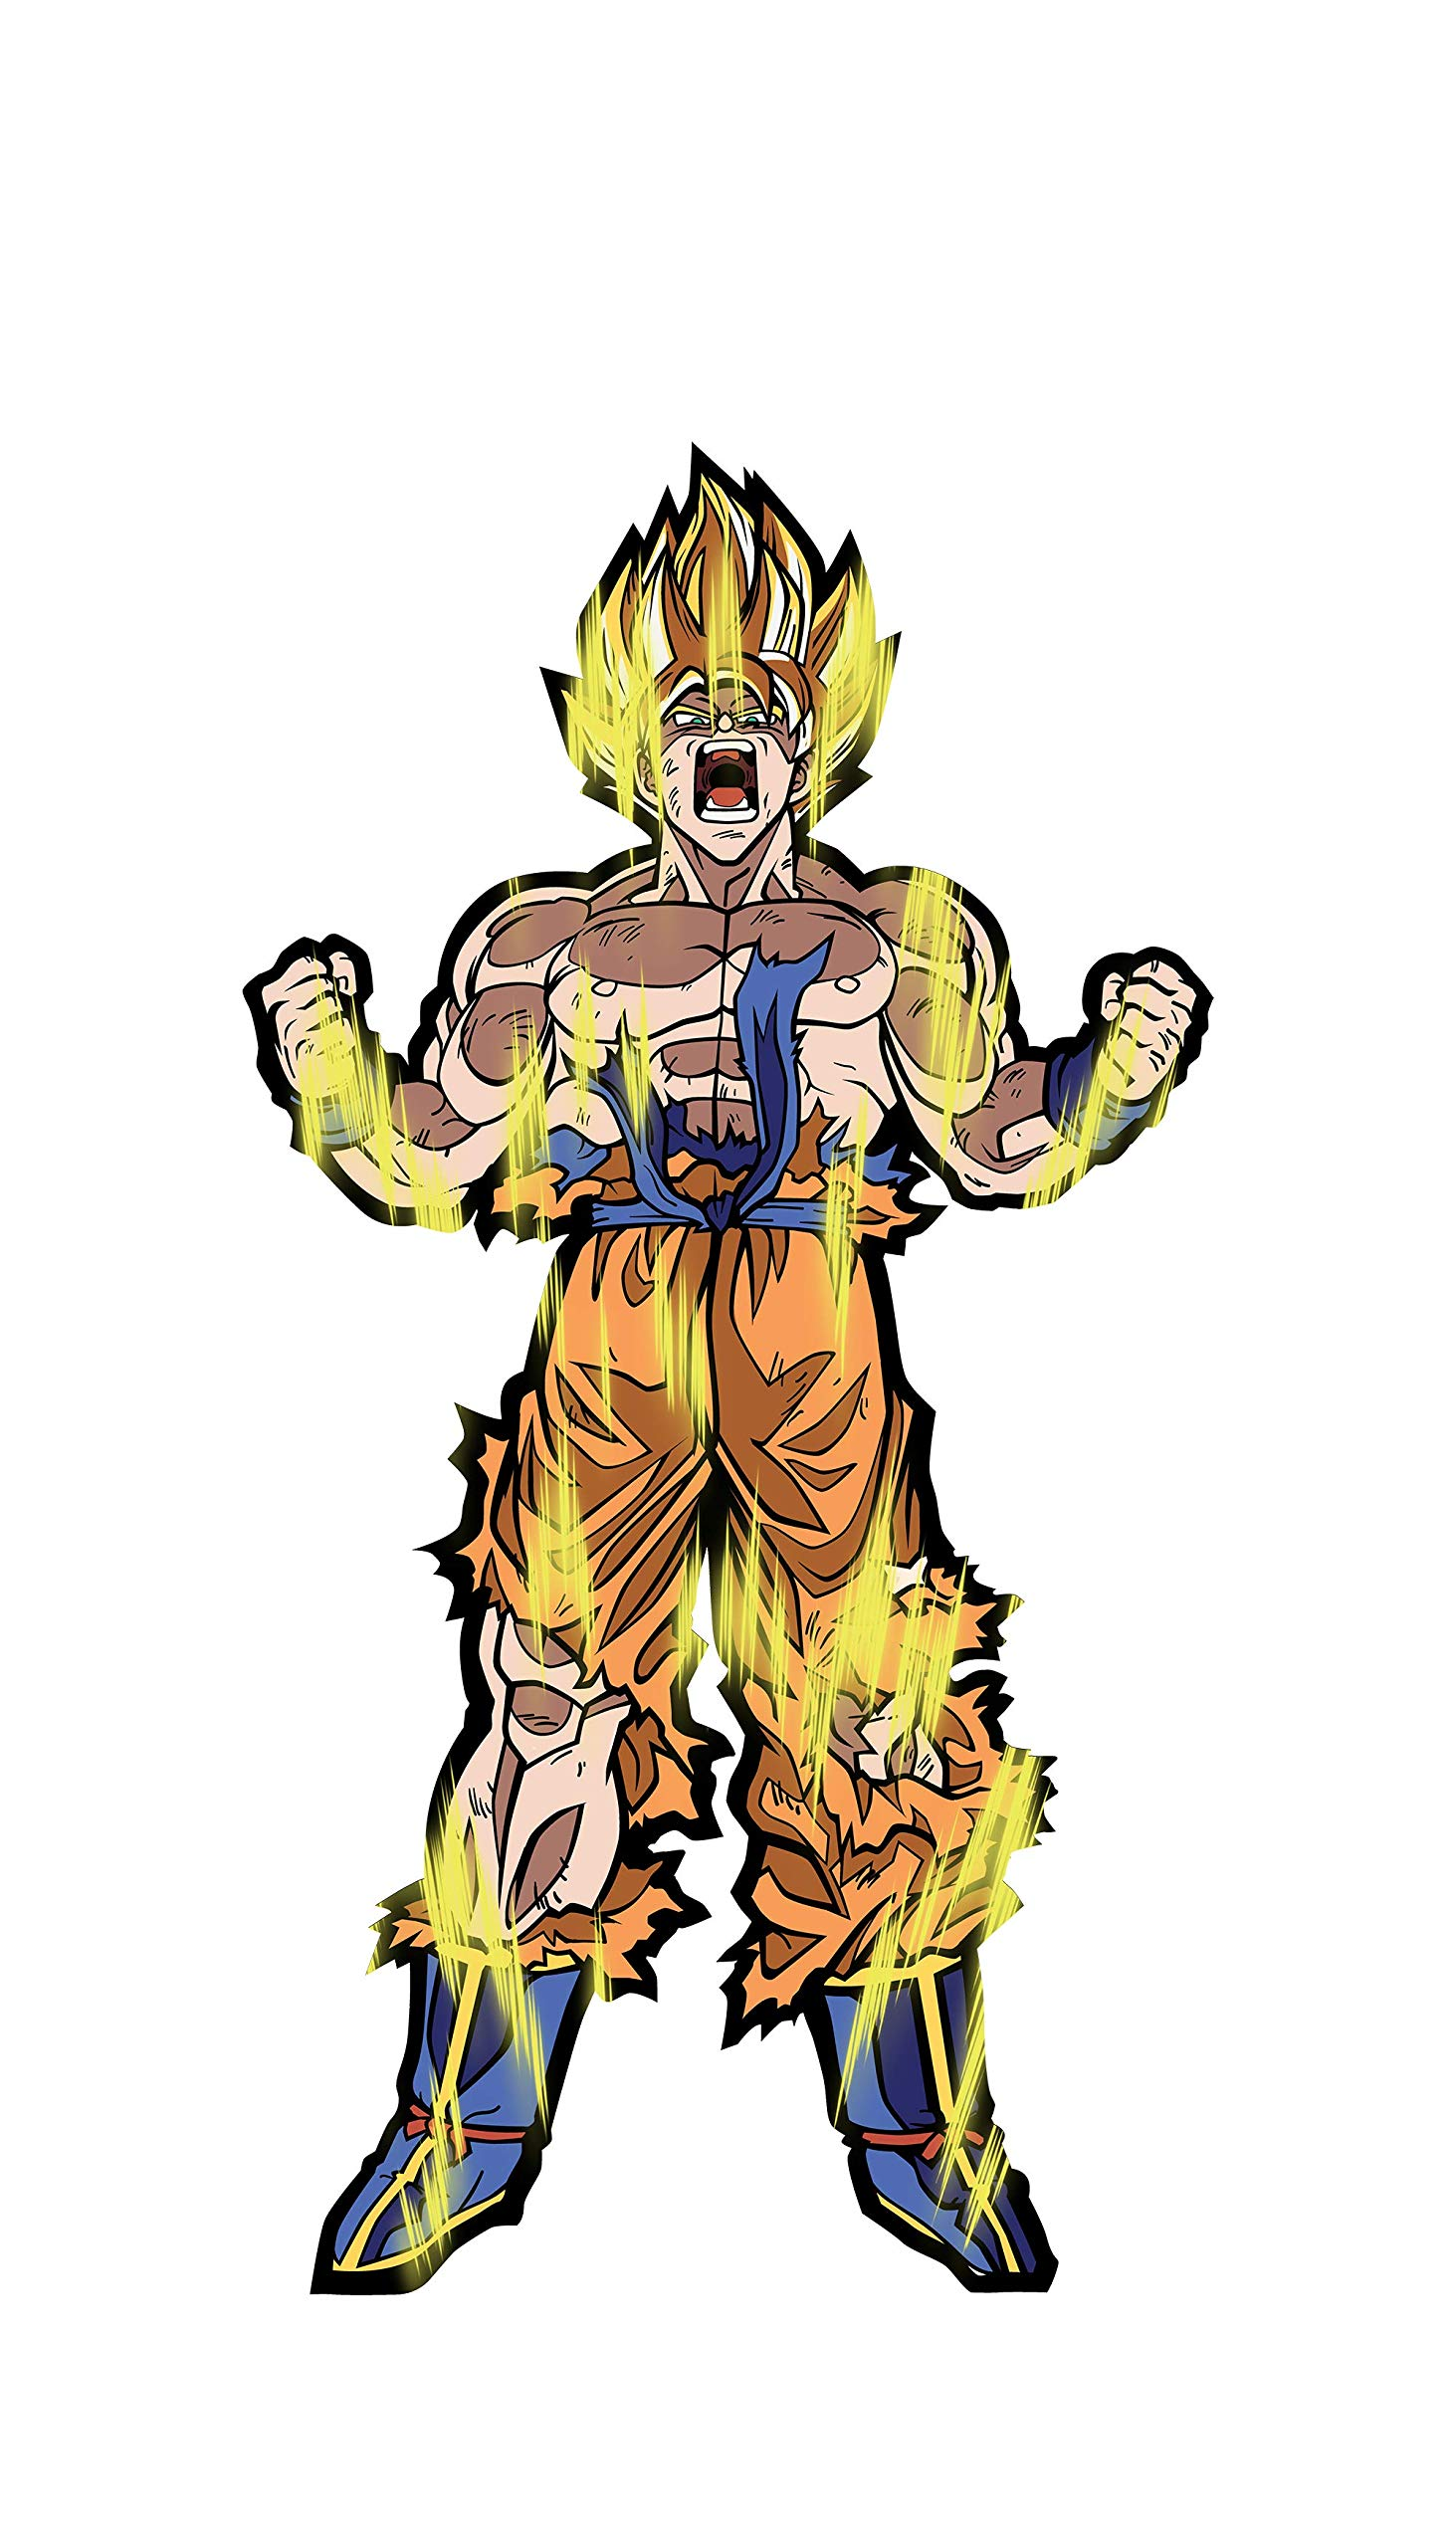 FiGPiN XL Dragon Ball Z: Super Saiyan Goku - Collectible Pin by FiGPiN (Image #3)